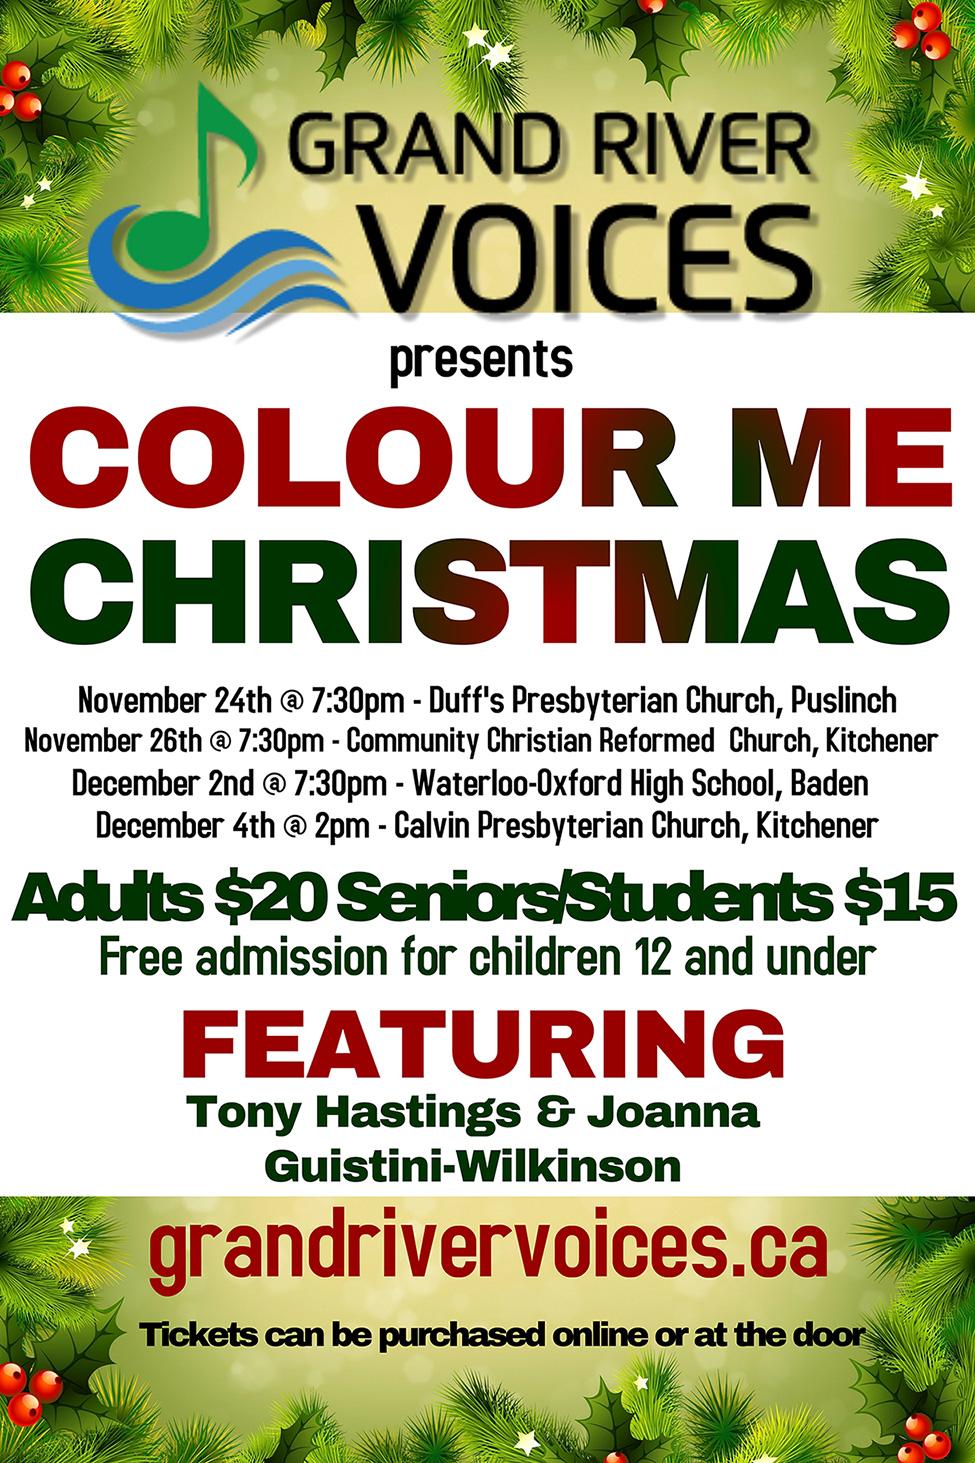 Colour Me Christmas Concert Series 2016 Poster